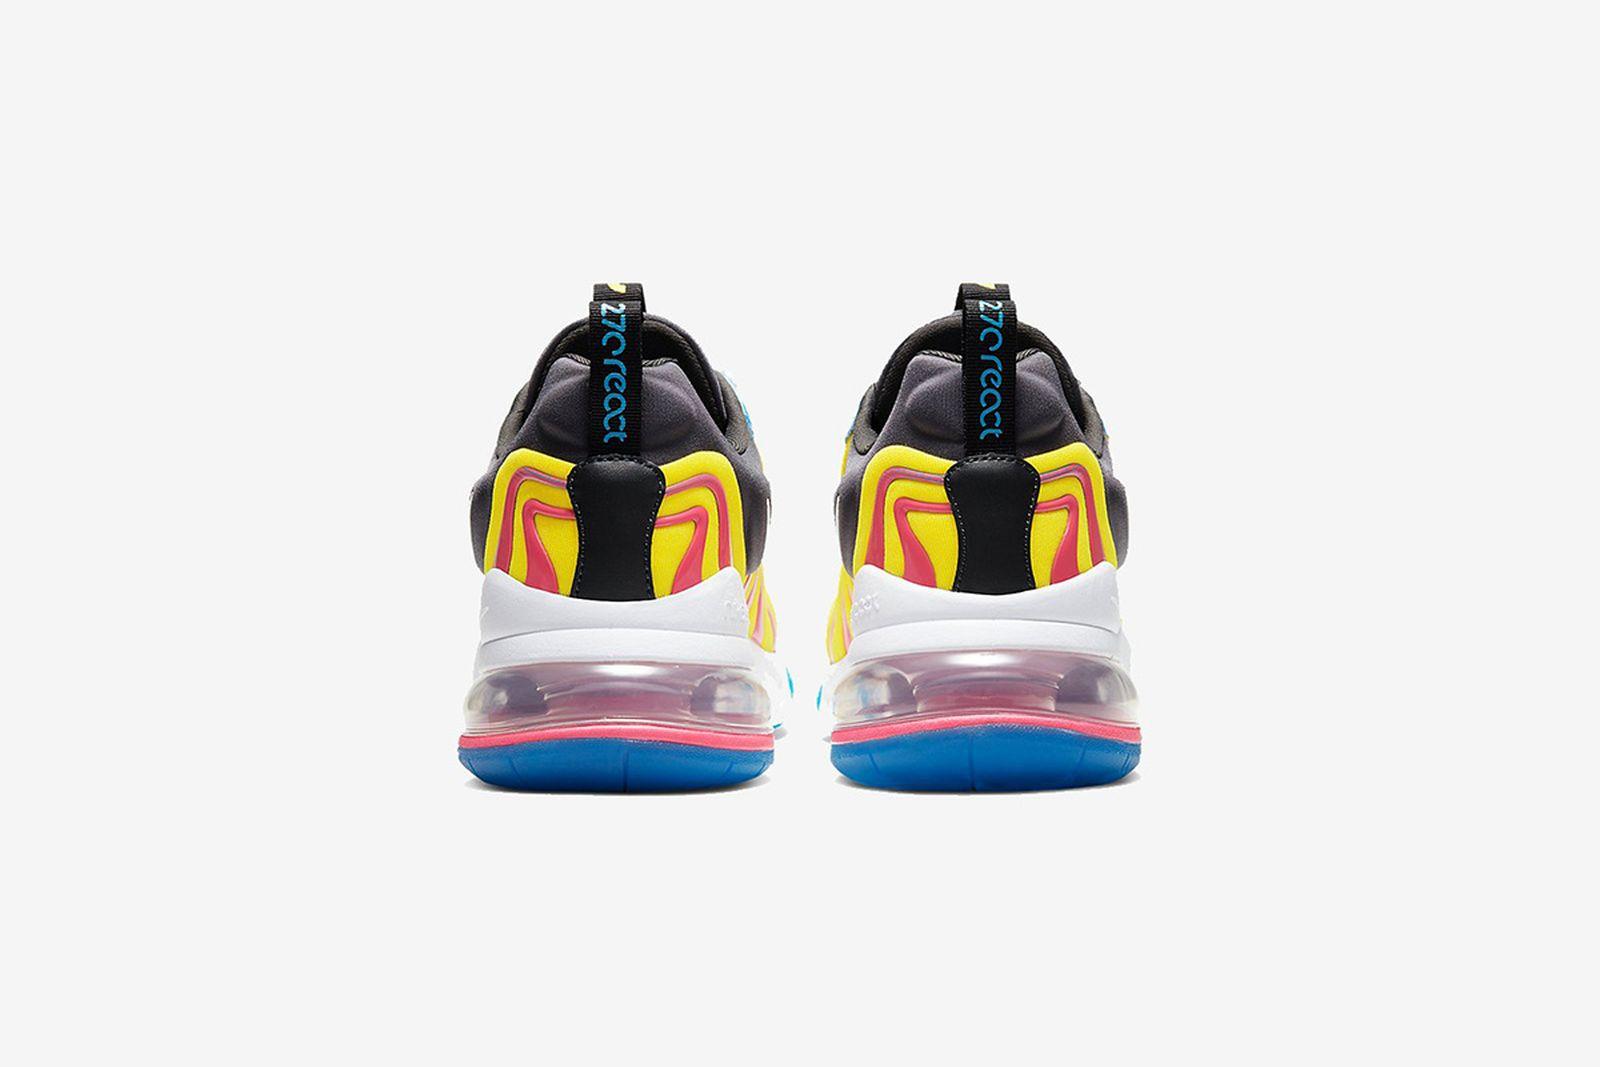 Nike Air Max 270 React Laser Blue/White/Anthracite